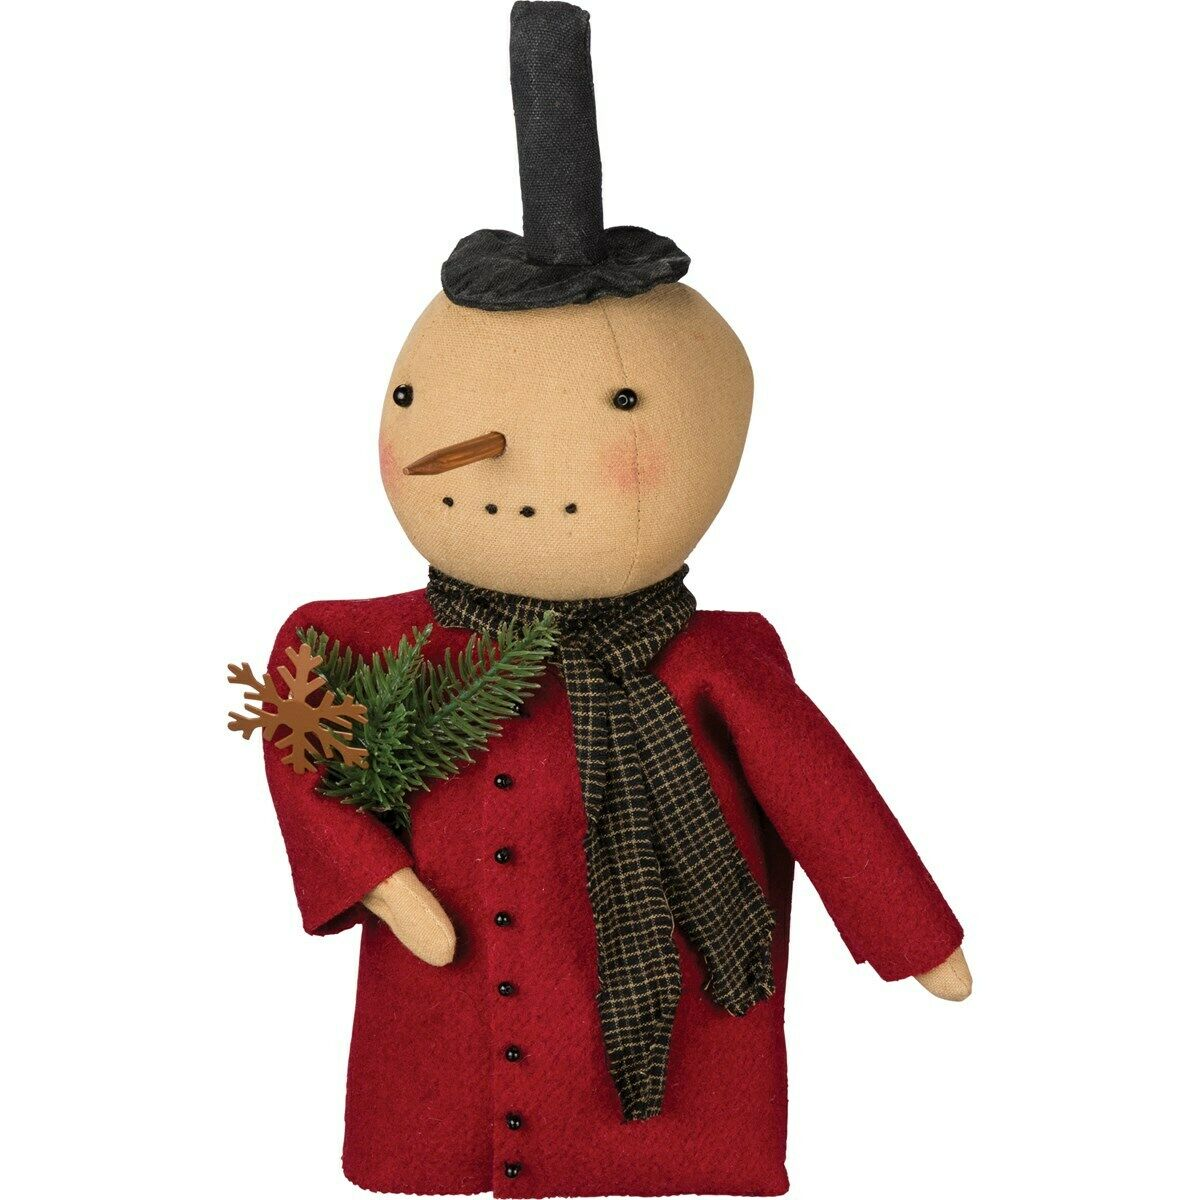 New Primitive Christmas Stuffed Red Coat Snowman Doll Tree